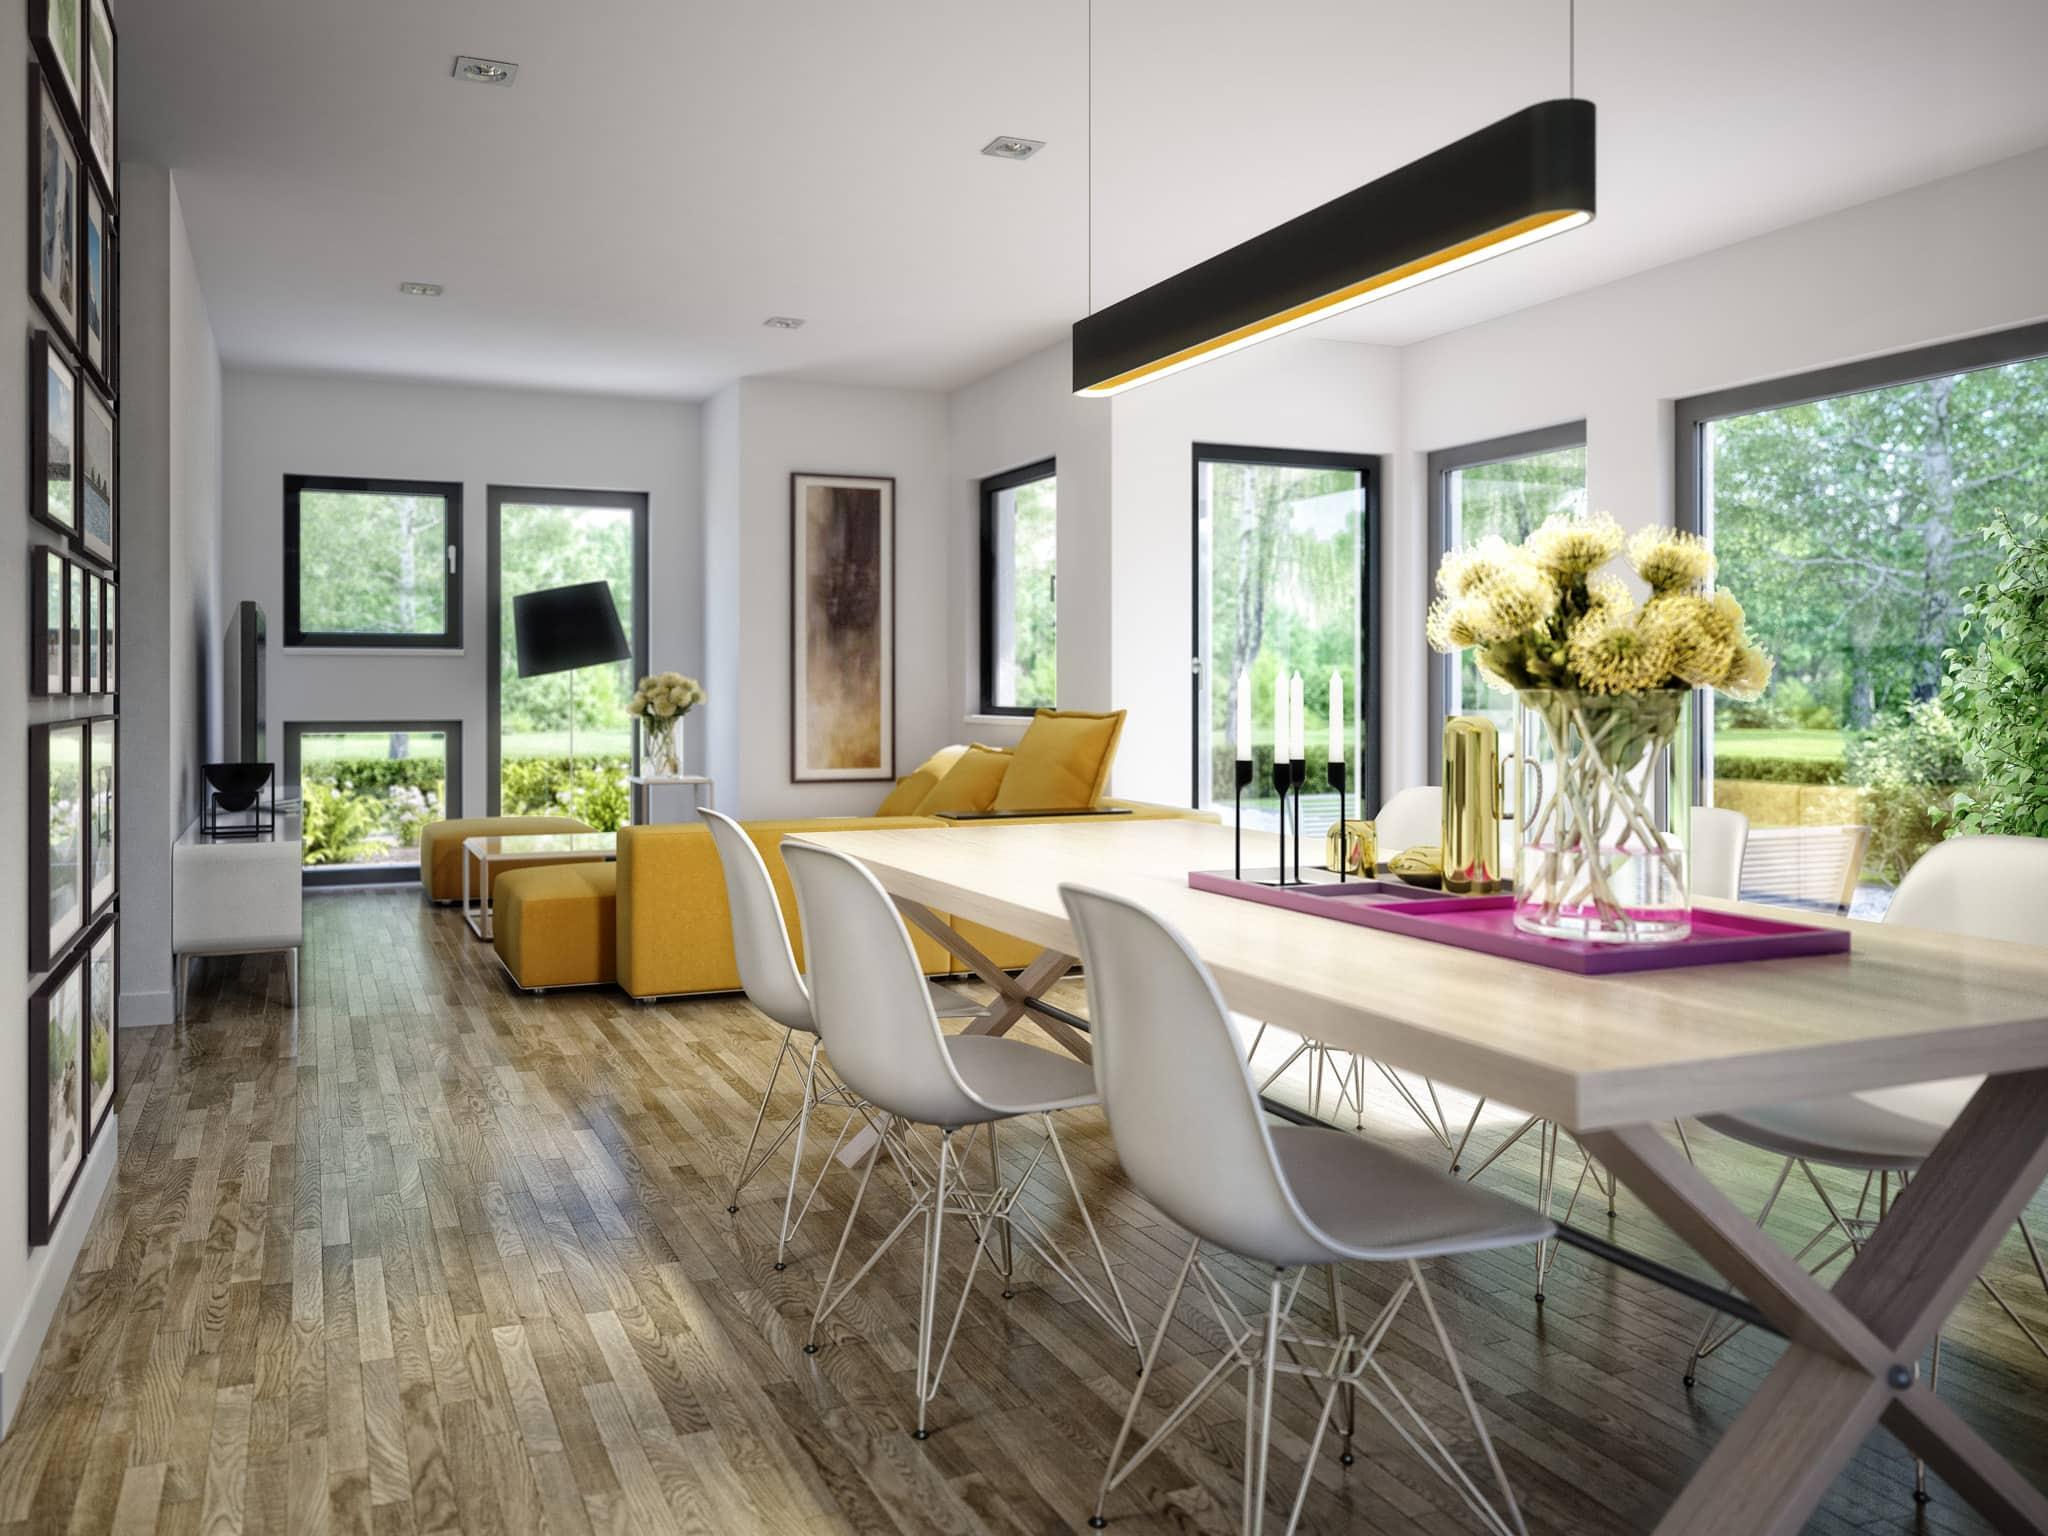 Wohn-Esszimmer Ideen - Einfamilienhaus Inneneinrichtung Fertighaus Living Haus SUNSHINE 126 V5 - HausbauDirekt.de